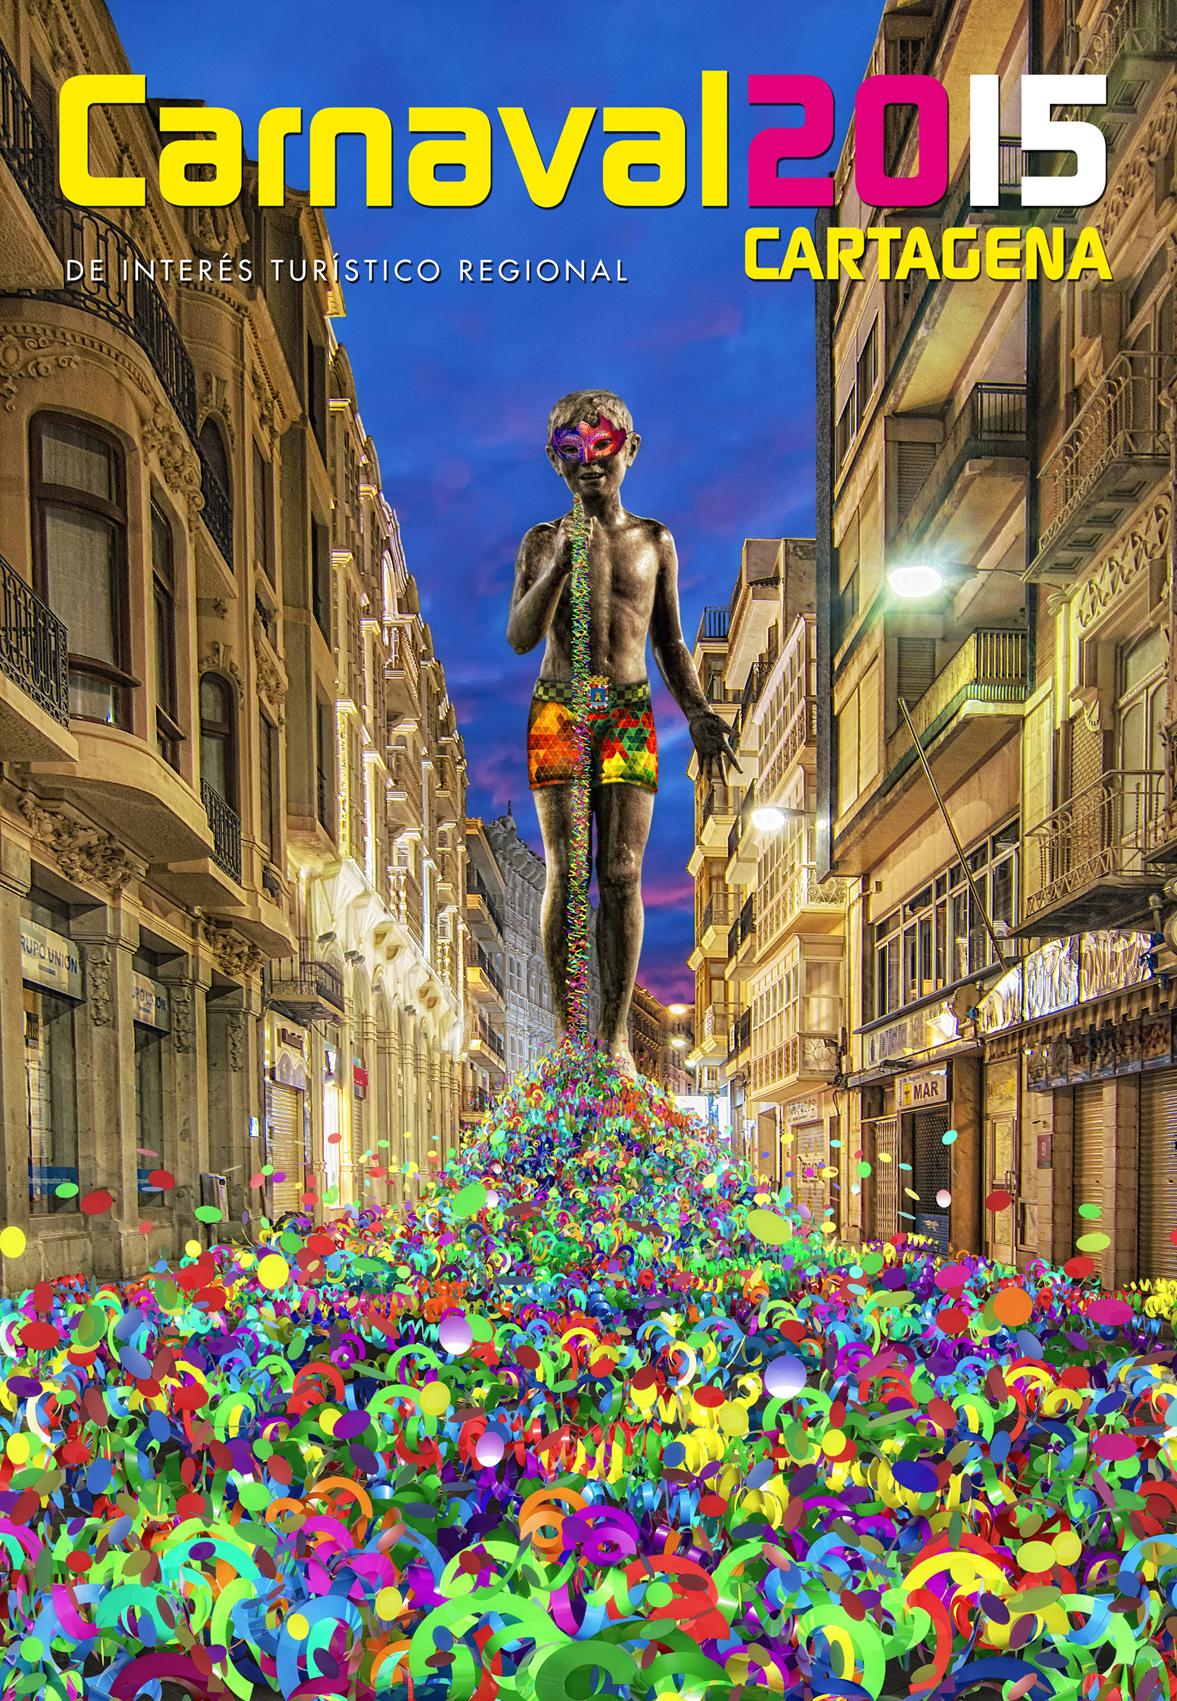 carnaval-2015-cartagena